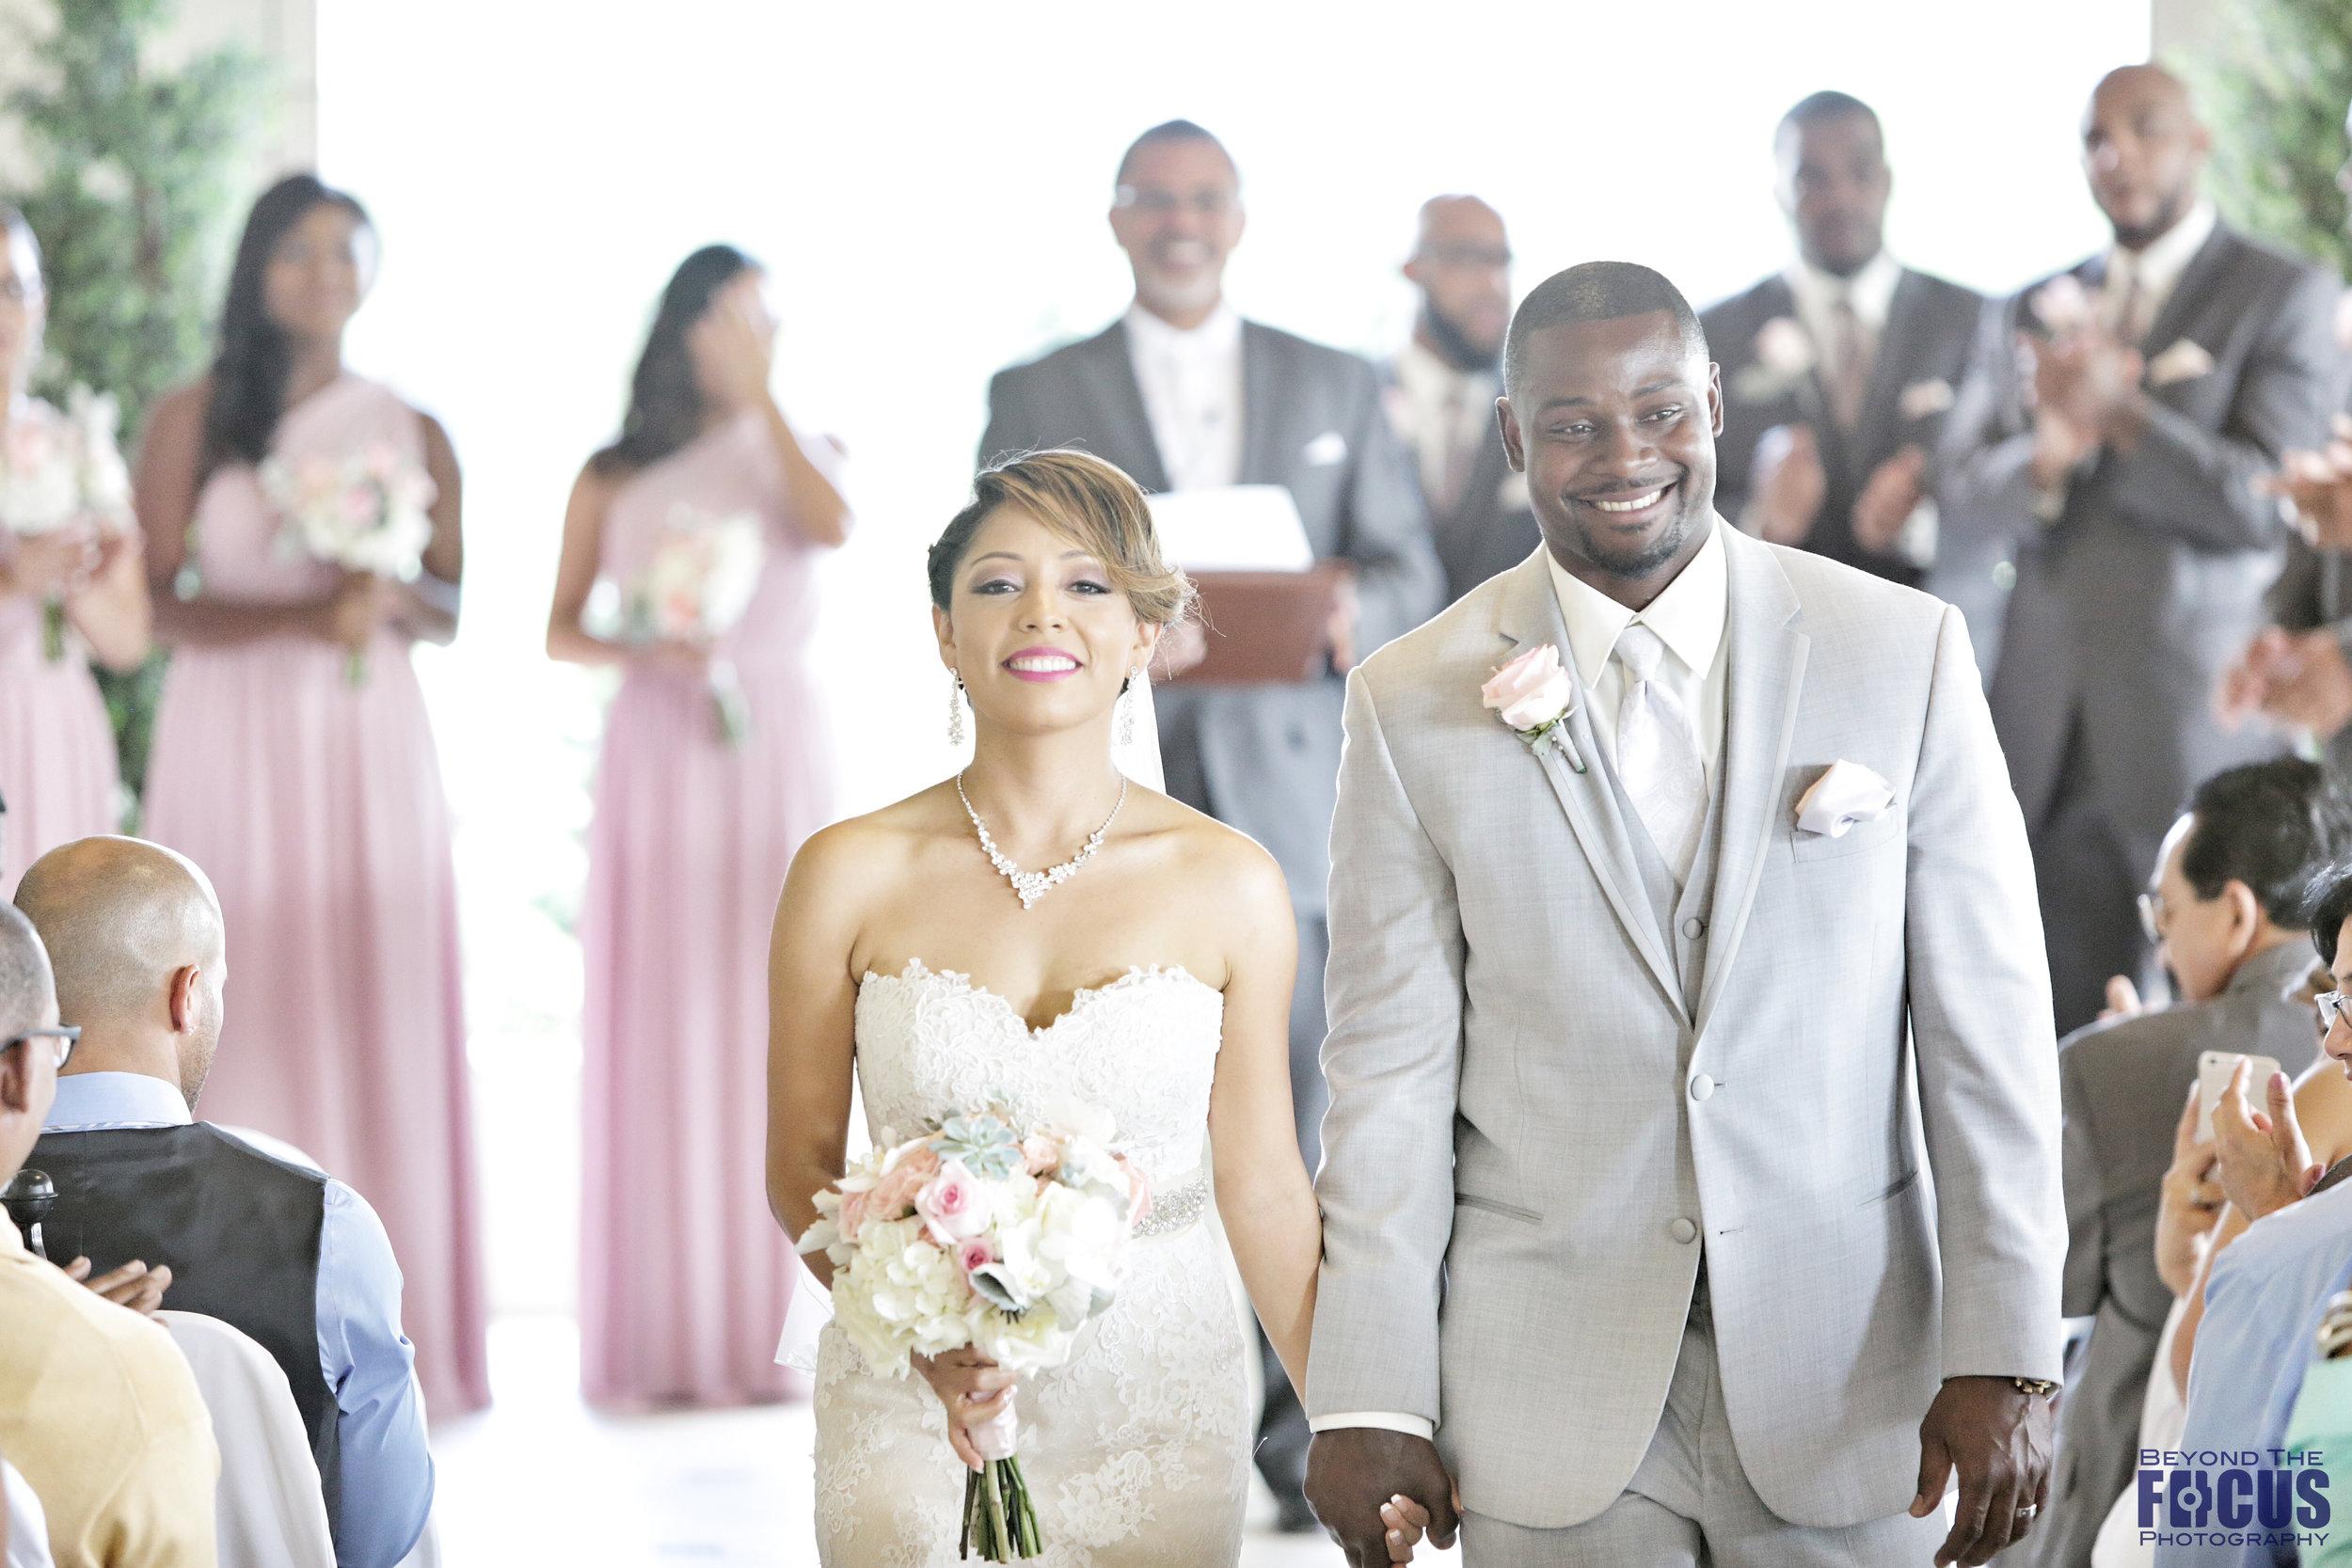 Palmer Wedding - Wedding Ceremony50.jpg